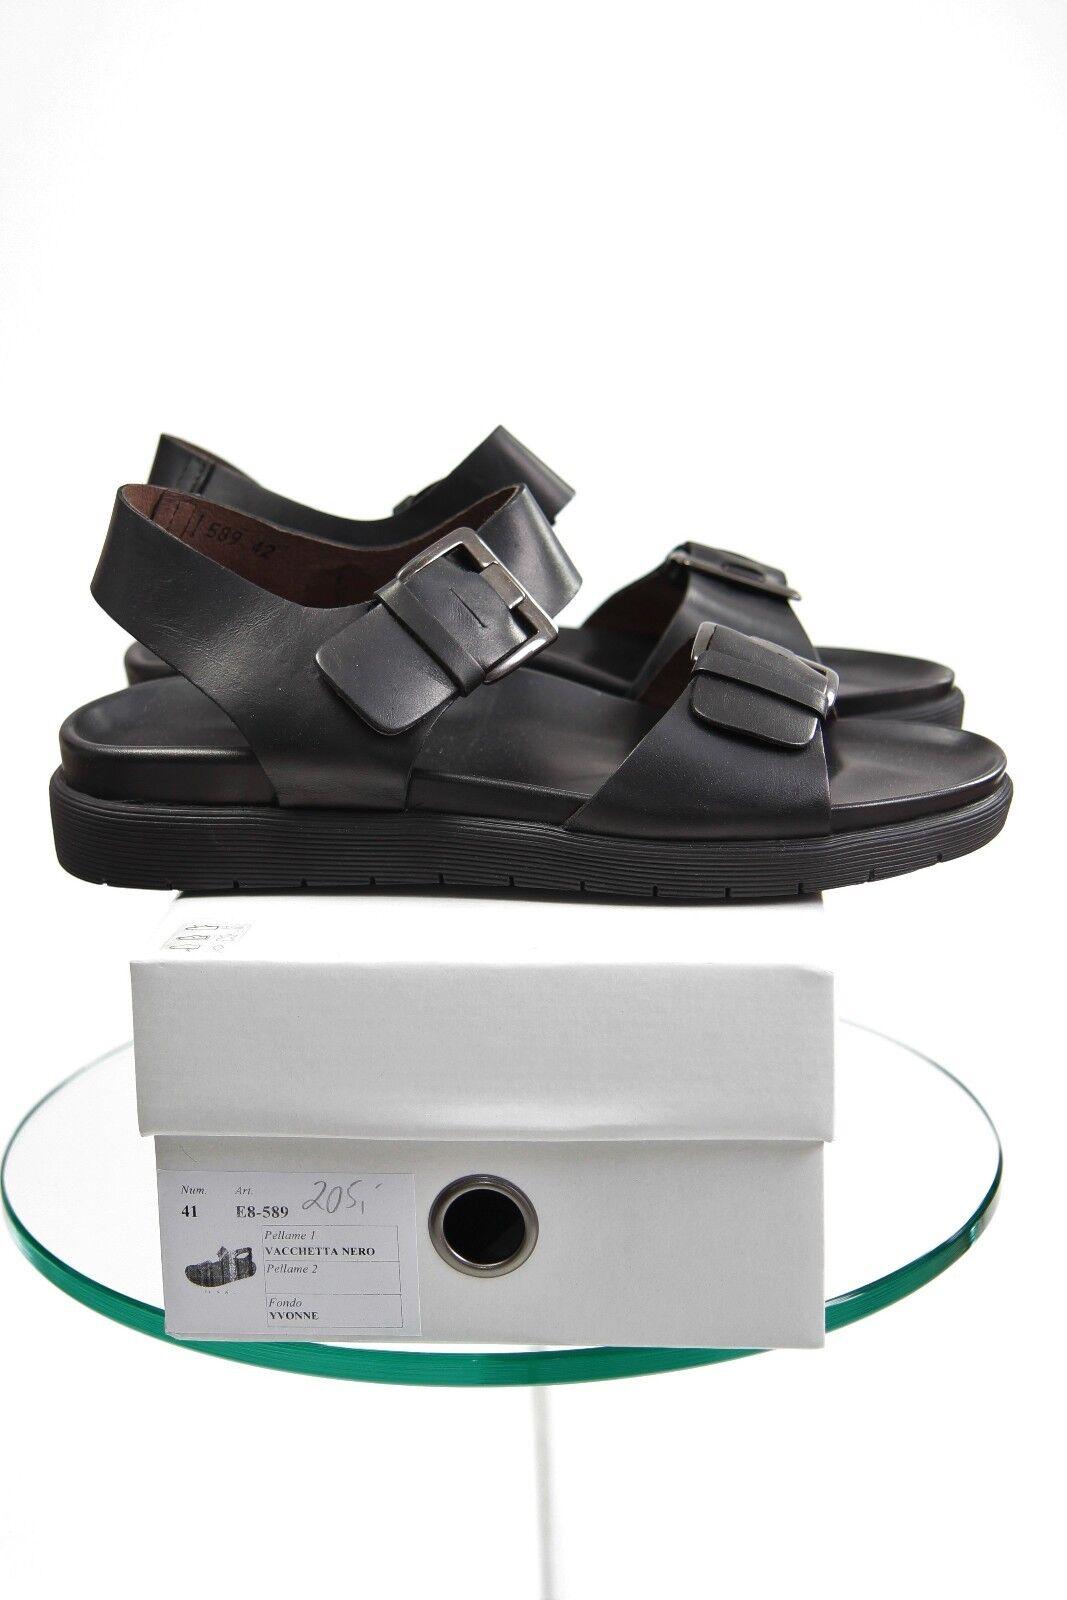 Lofina Damenschuhe Sandale 10,5 Gr. 42/UK 8,0/ US 10,5 Sandale Lagenlook, schwarz 1024f0